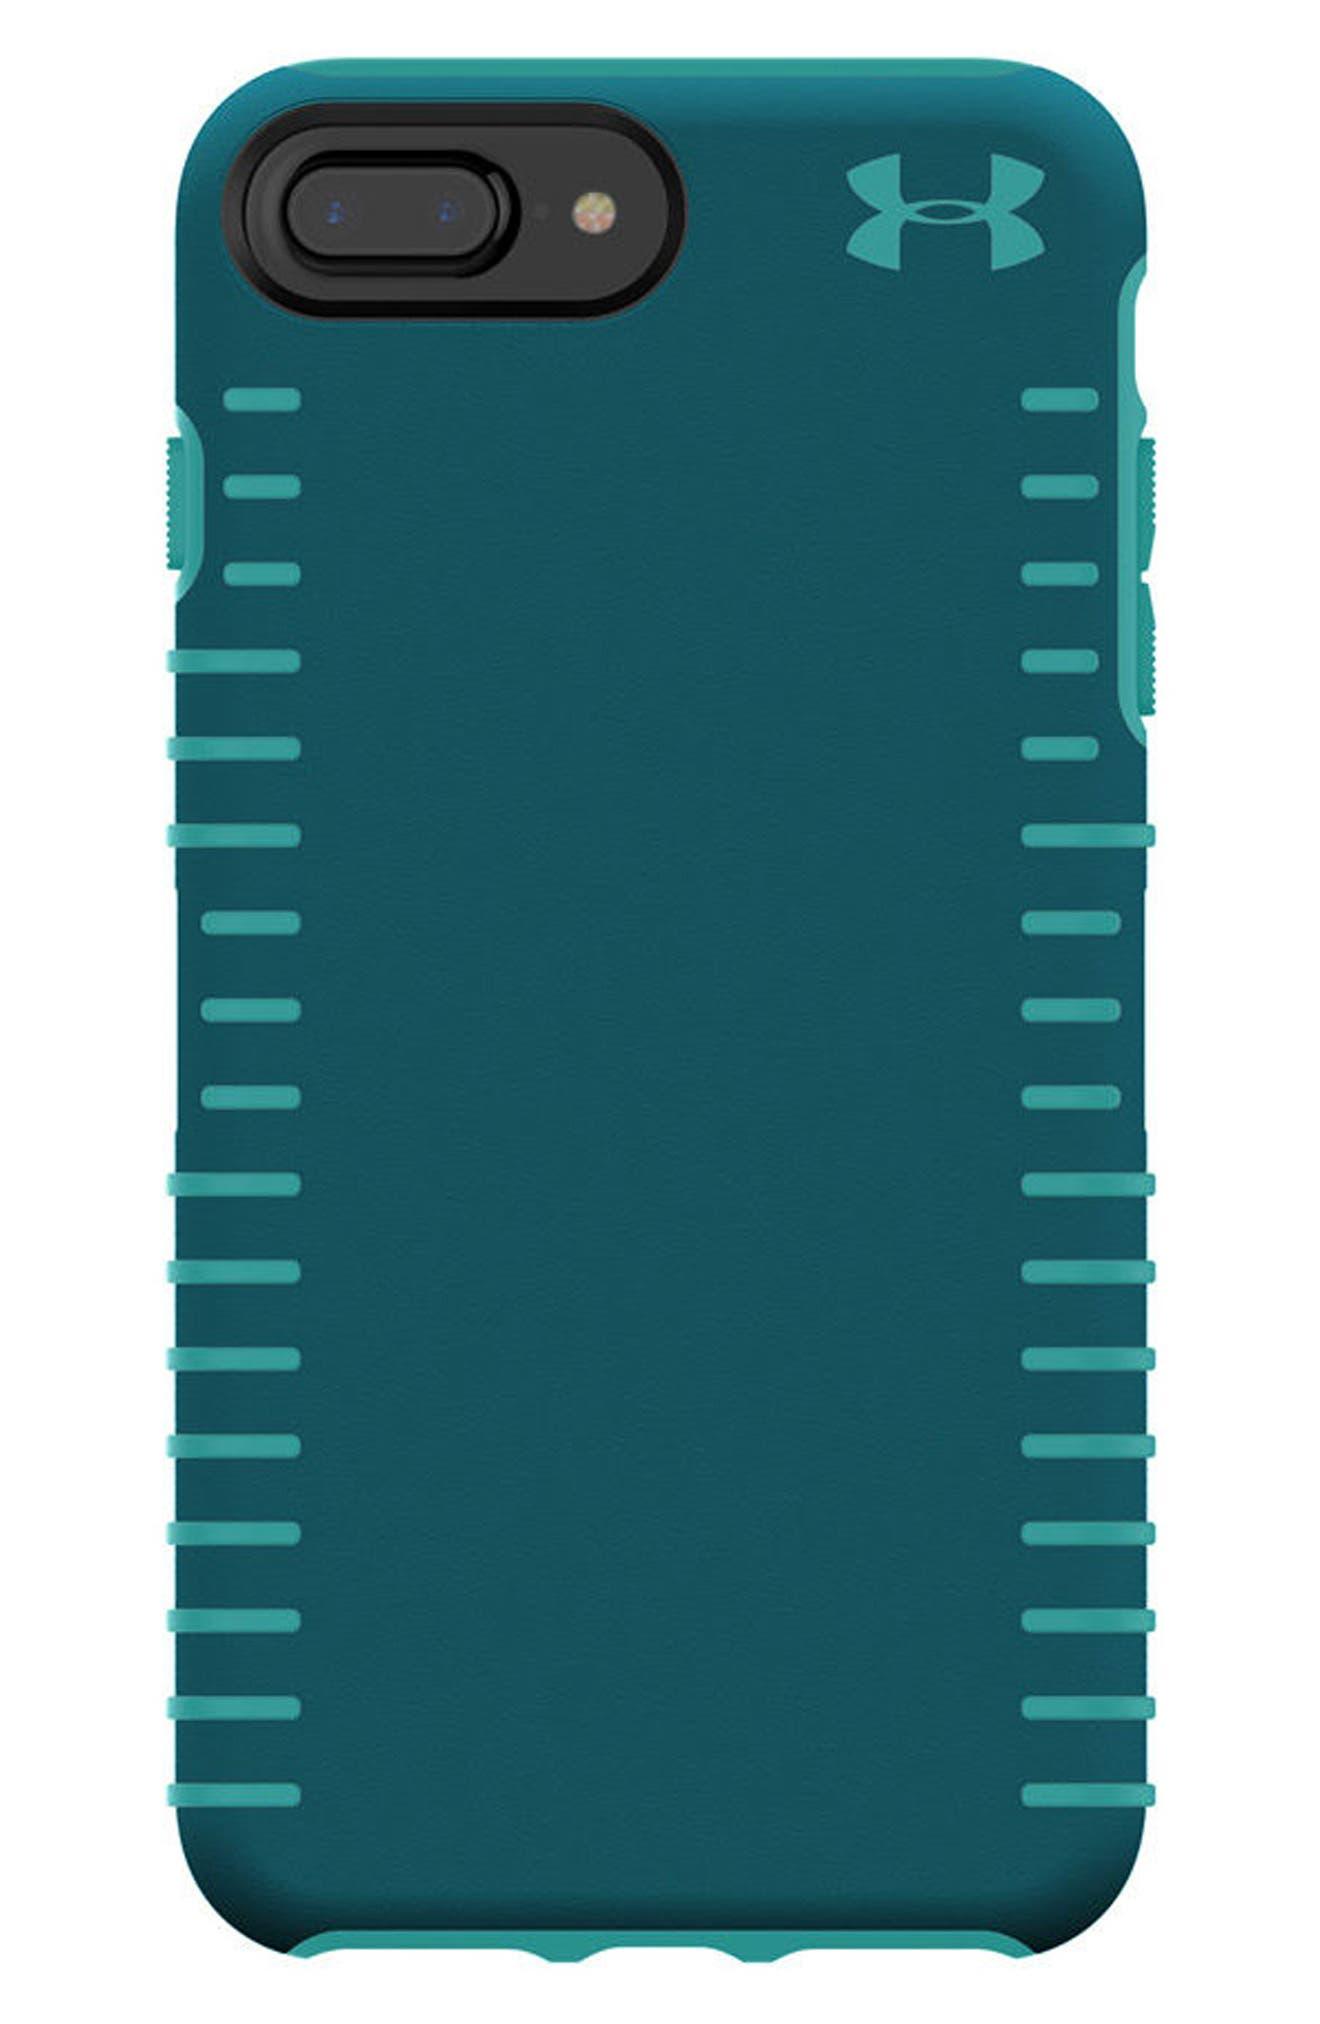 Protect Grip iPhone 6/6s/7/8 Plus Case,                         Main,                         color, Desert Sky